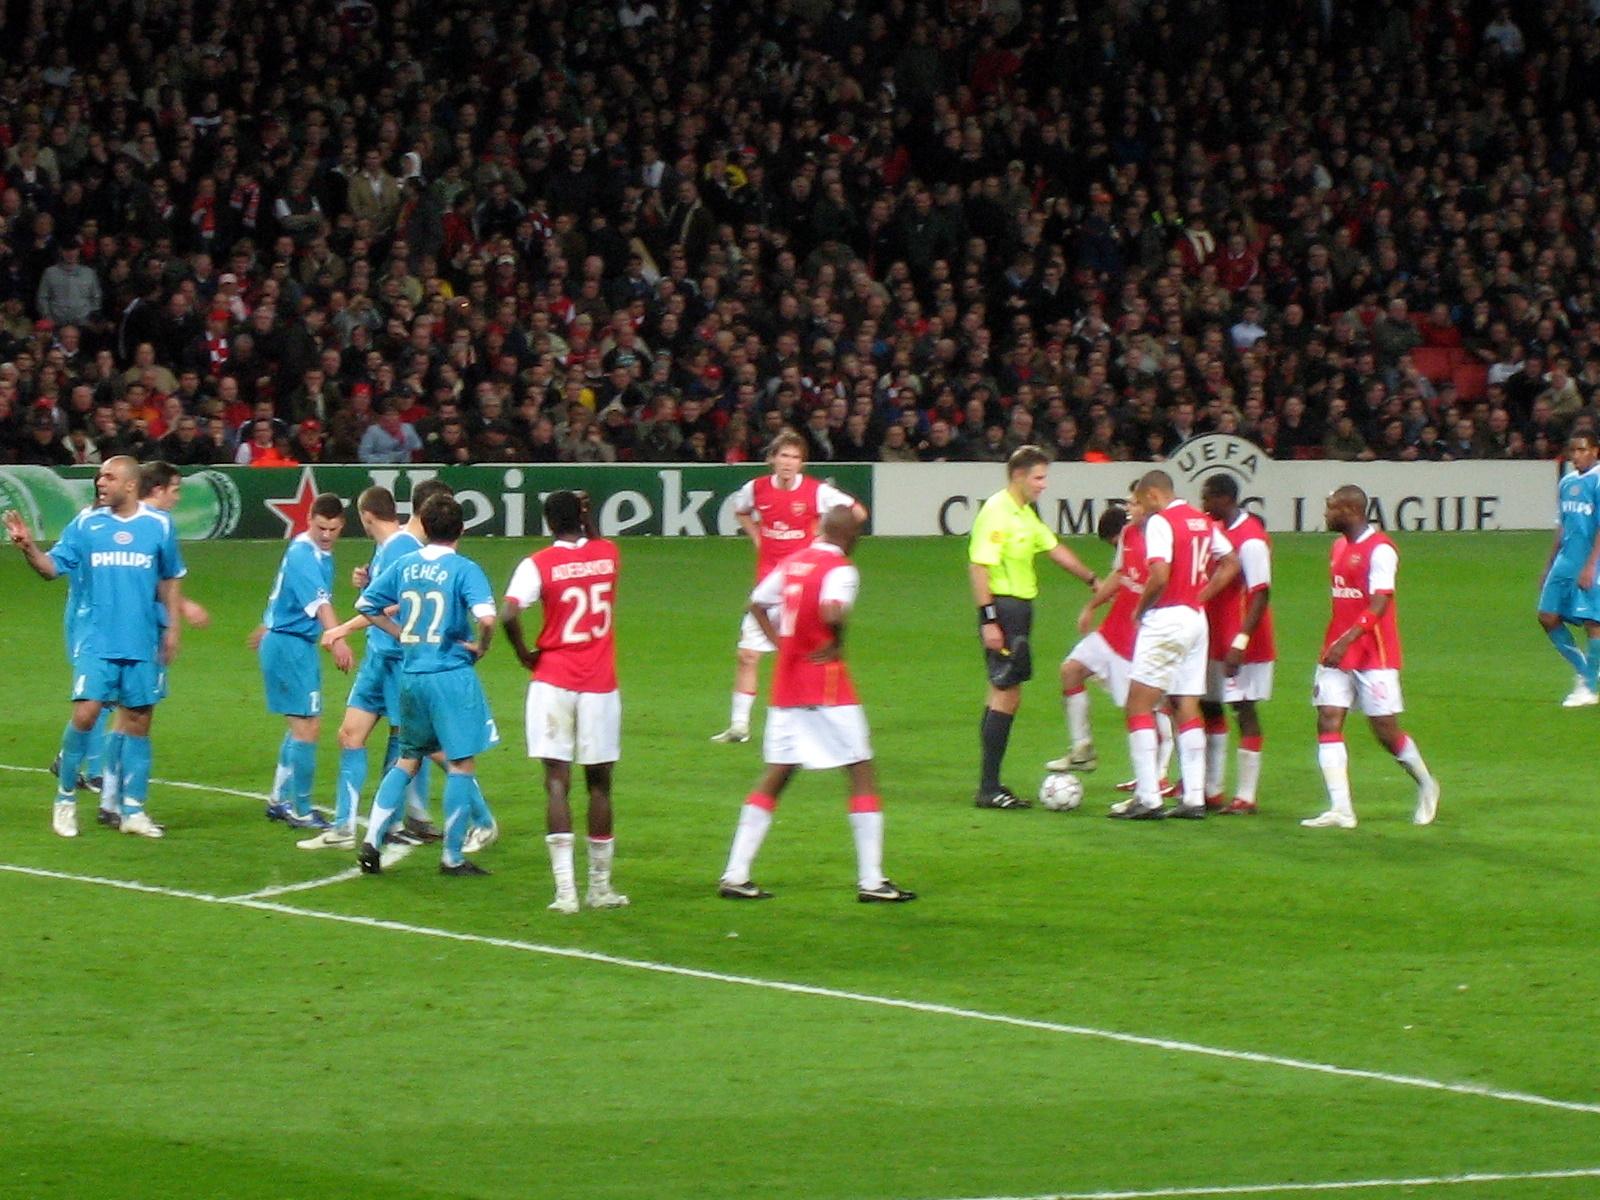 Arsenal Wikipedia: File:Arsenal-PSV.jpg